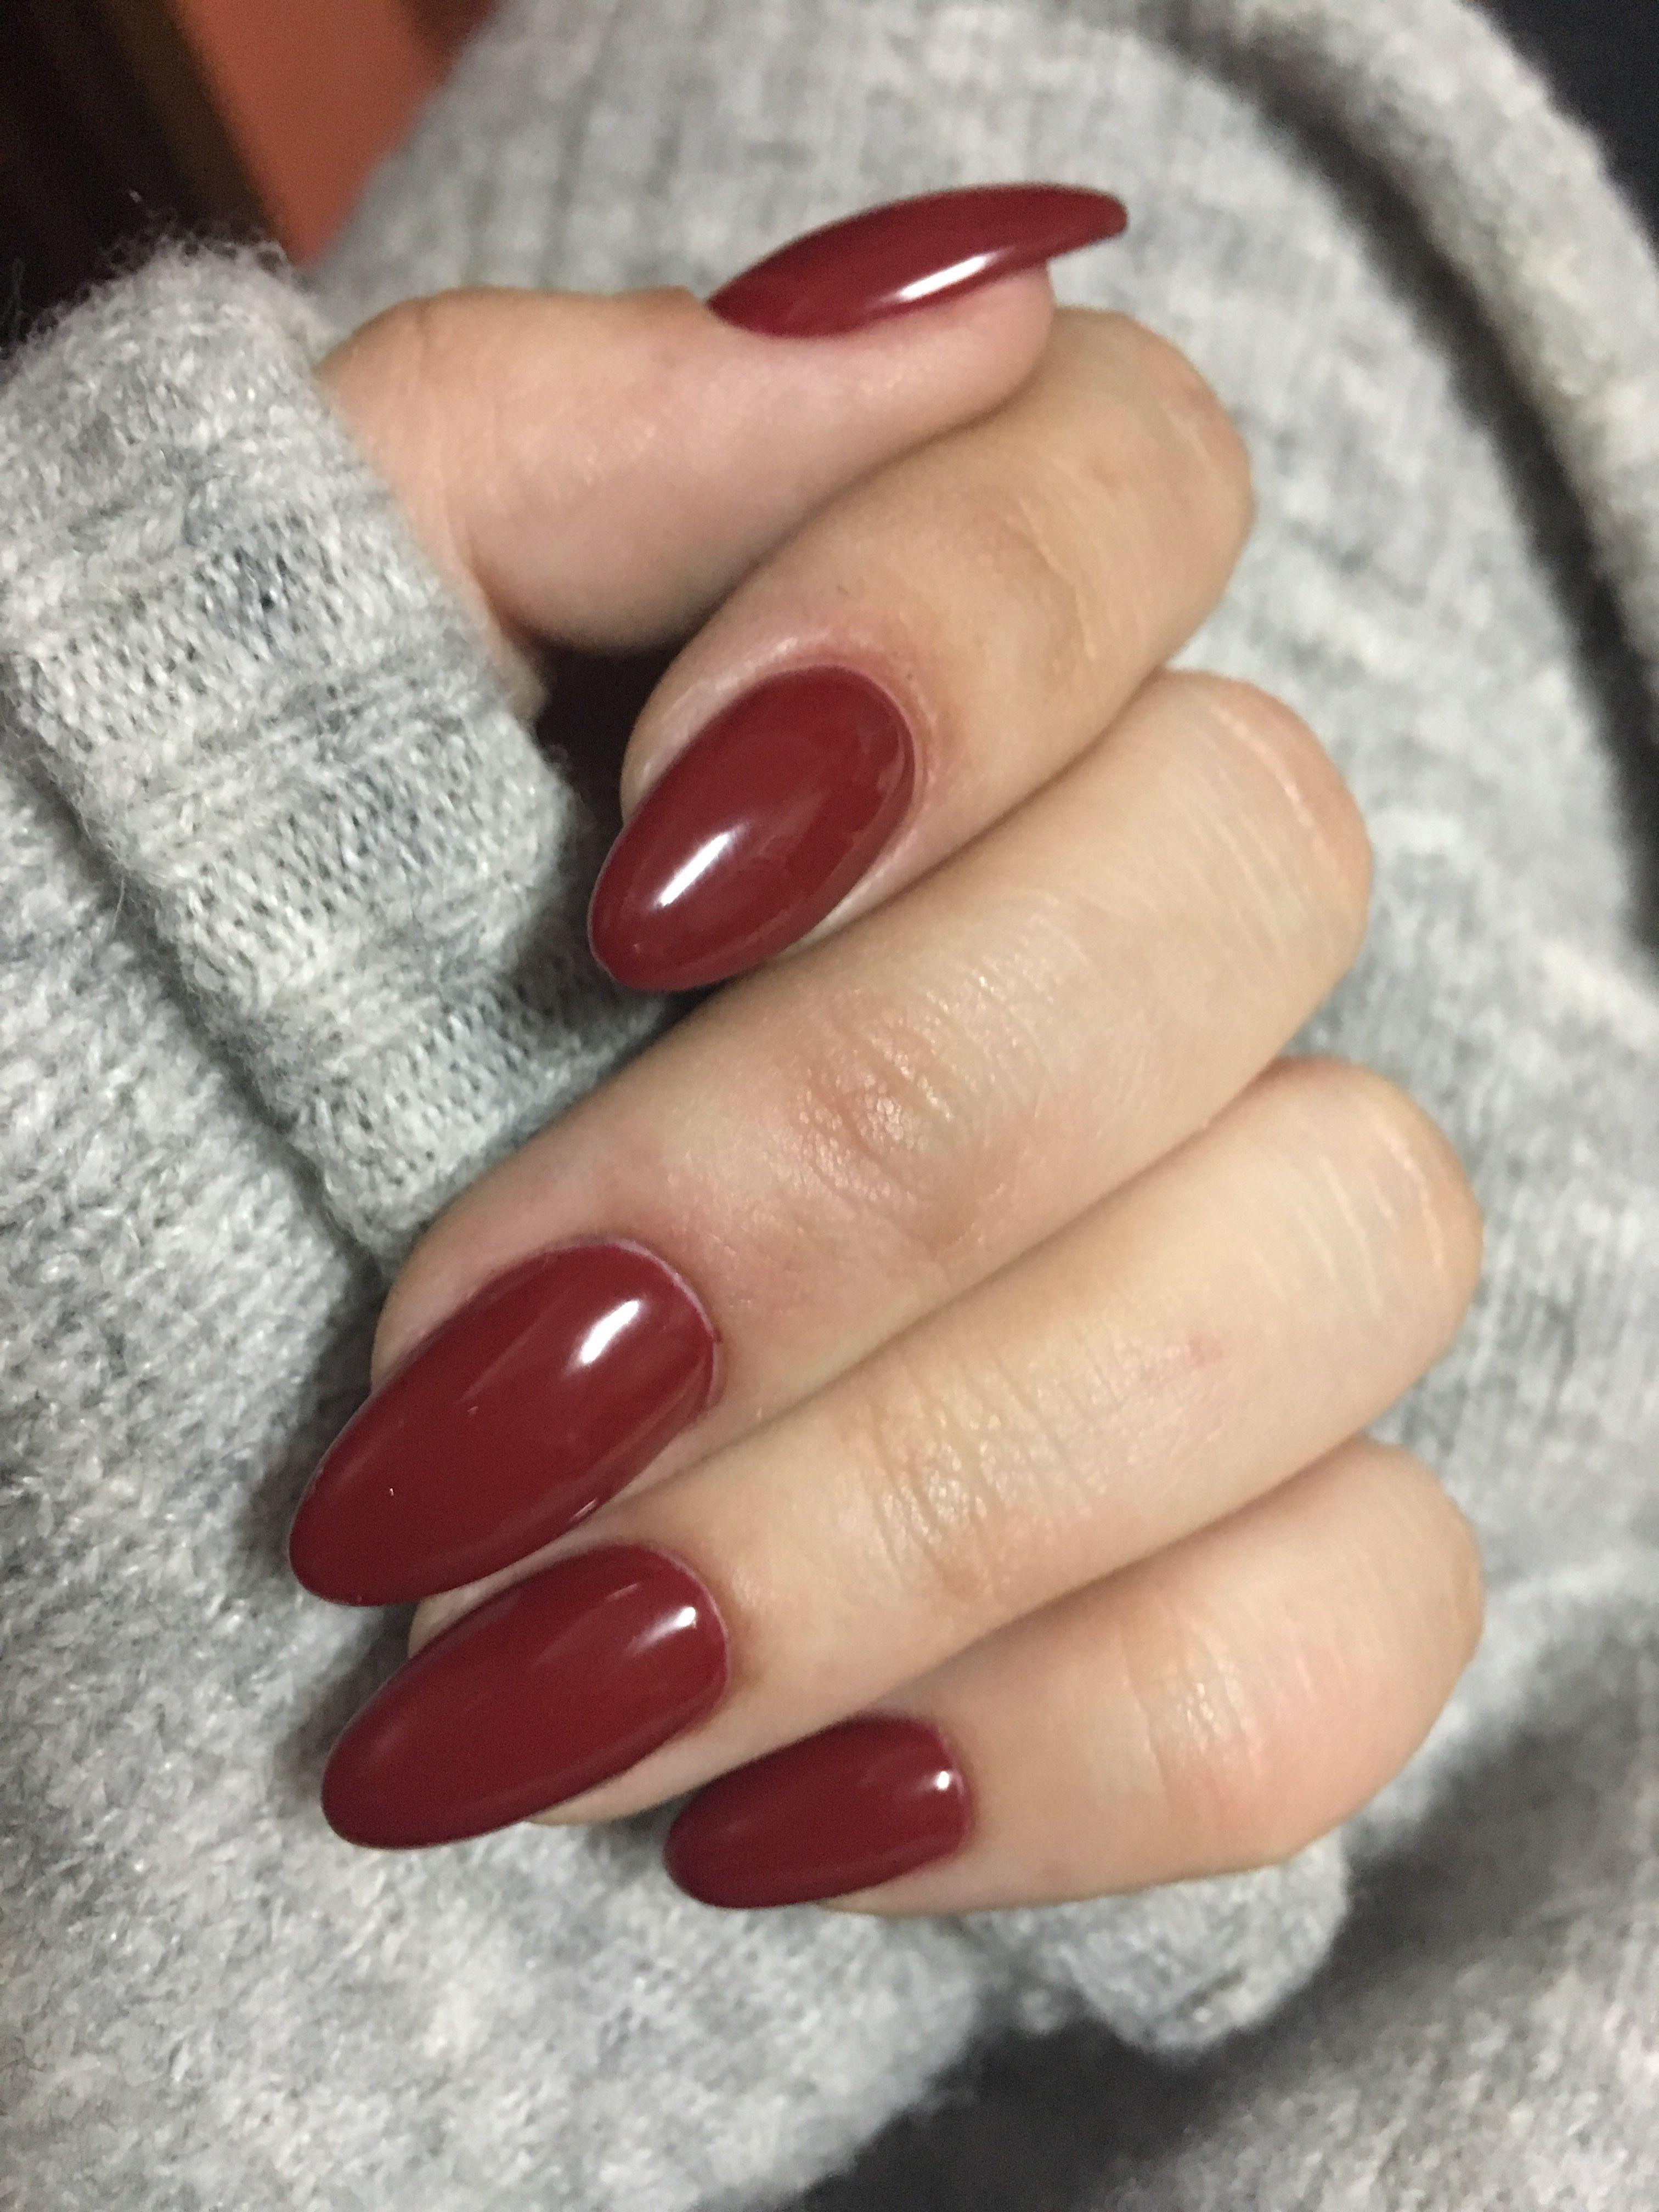 Burgundy Nails Unhas Bordo Almond Nails Burgundy Nails Almond Acrylic Nails Diy Nails